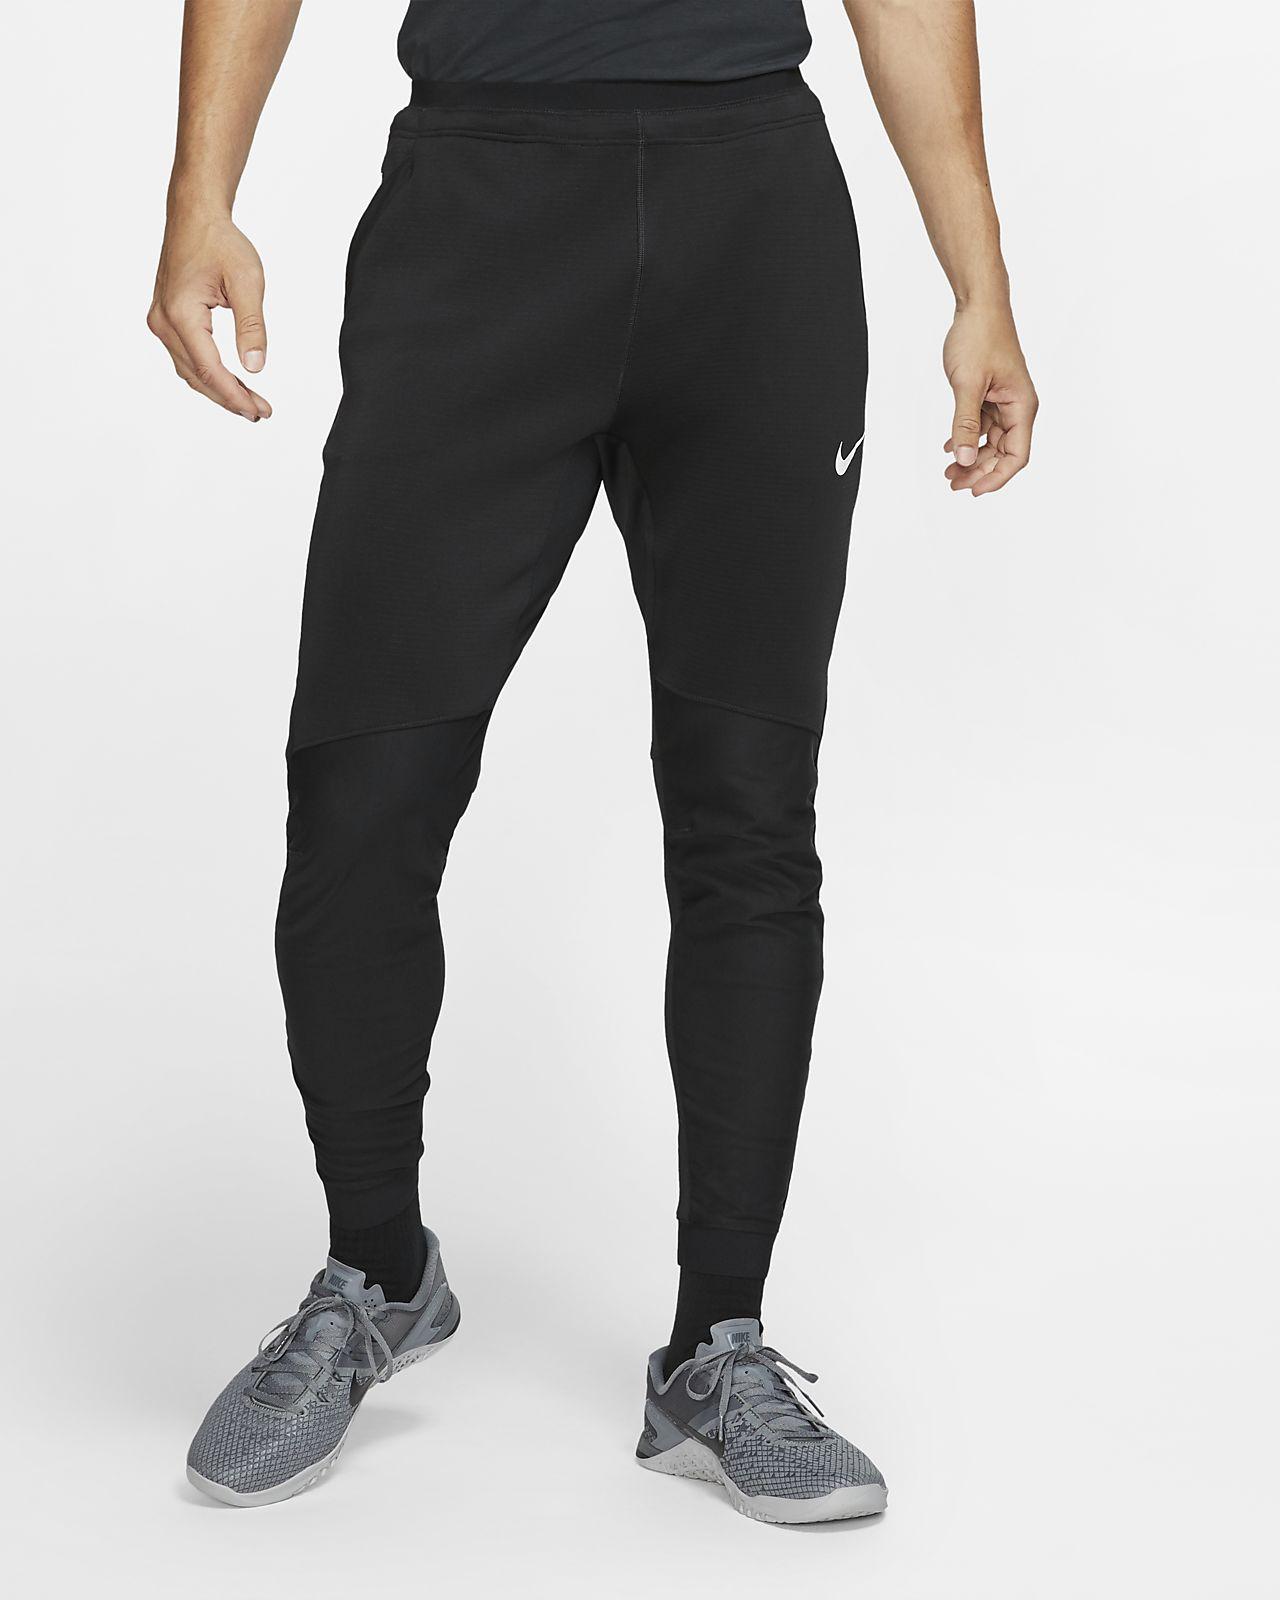 Men's Nike Pants | Eastbay